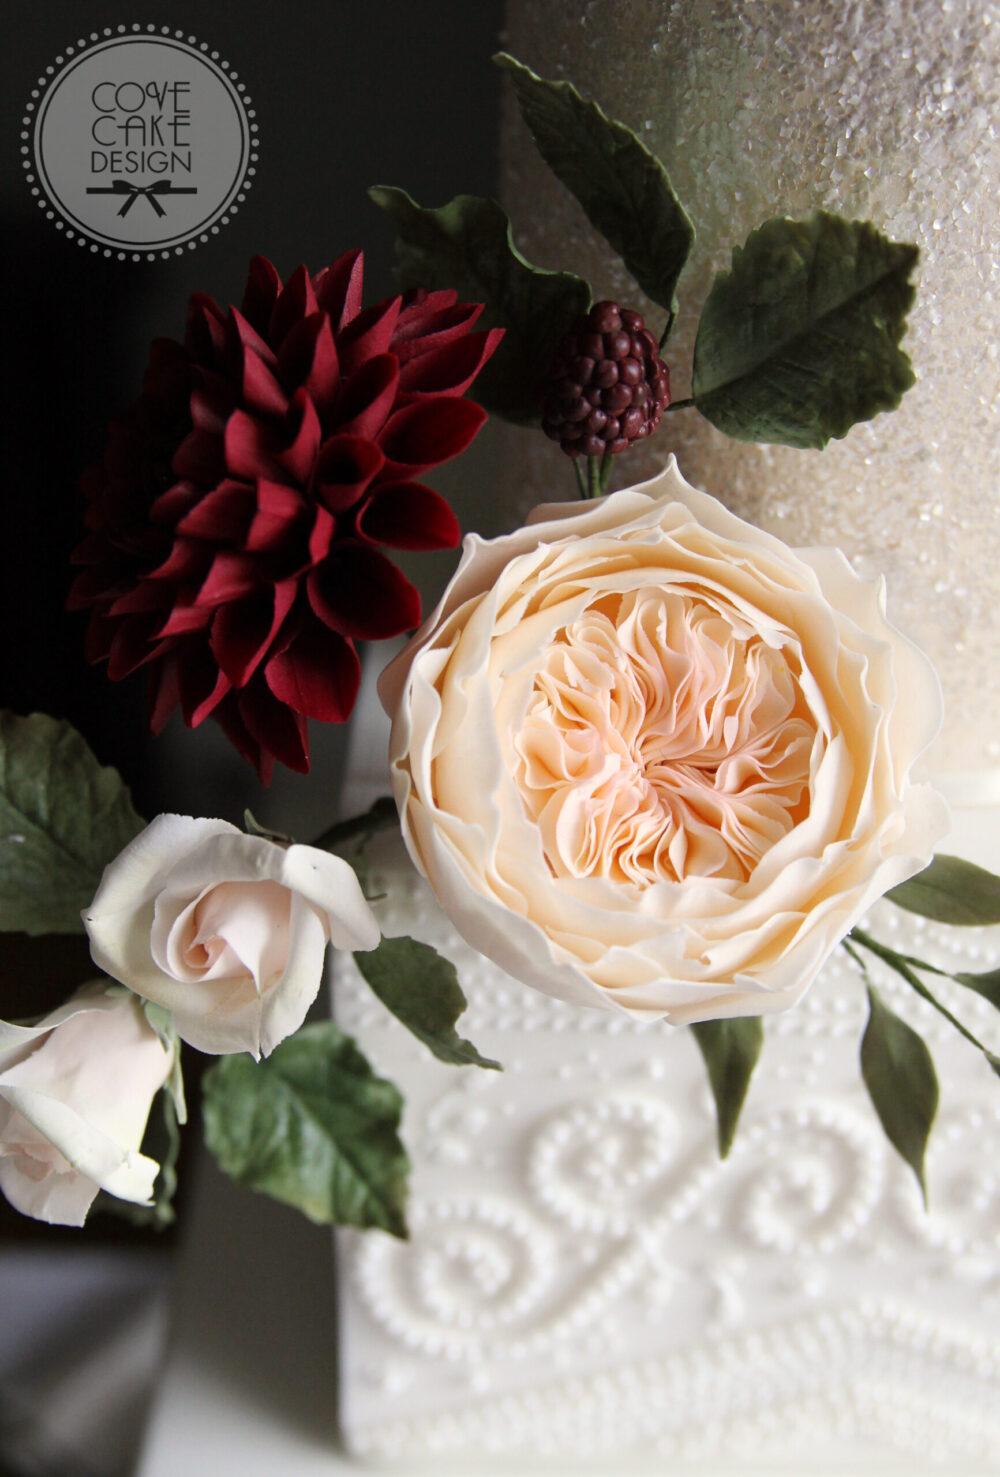 Bridal Detail Wedding Cake Cove Cake Design